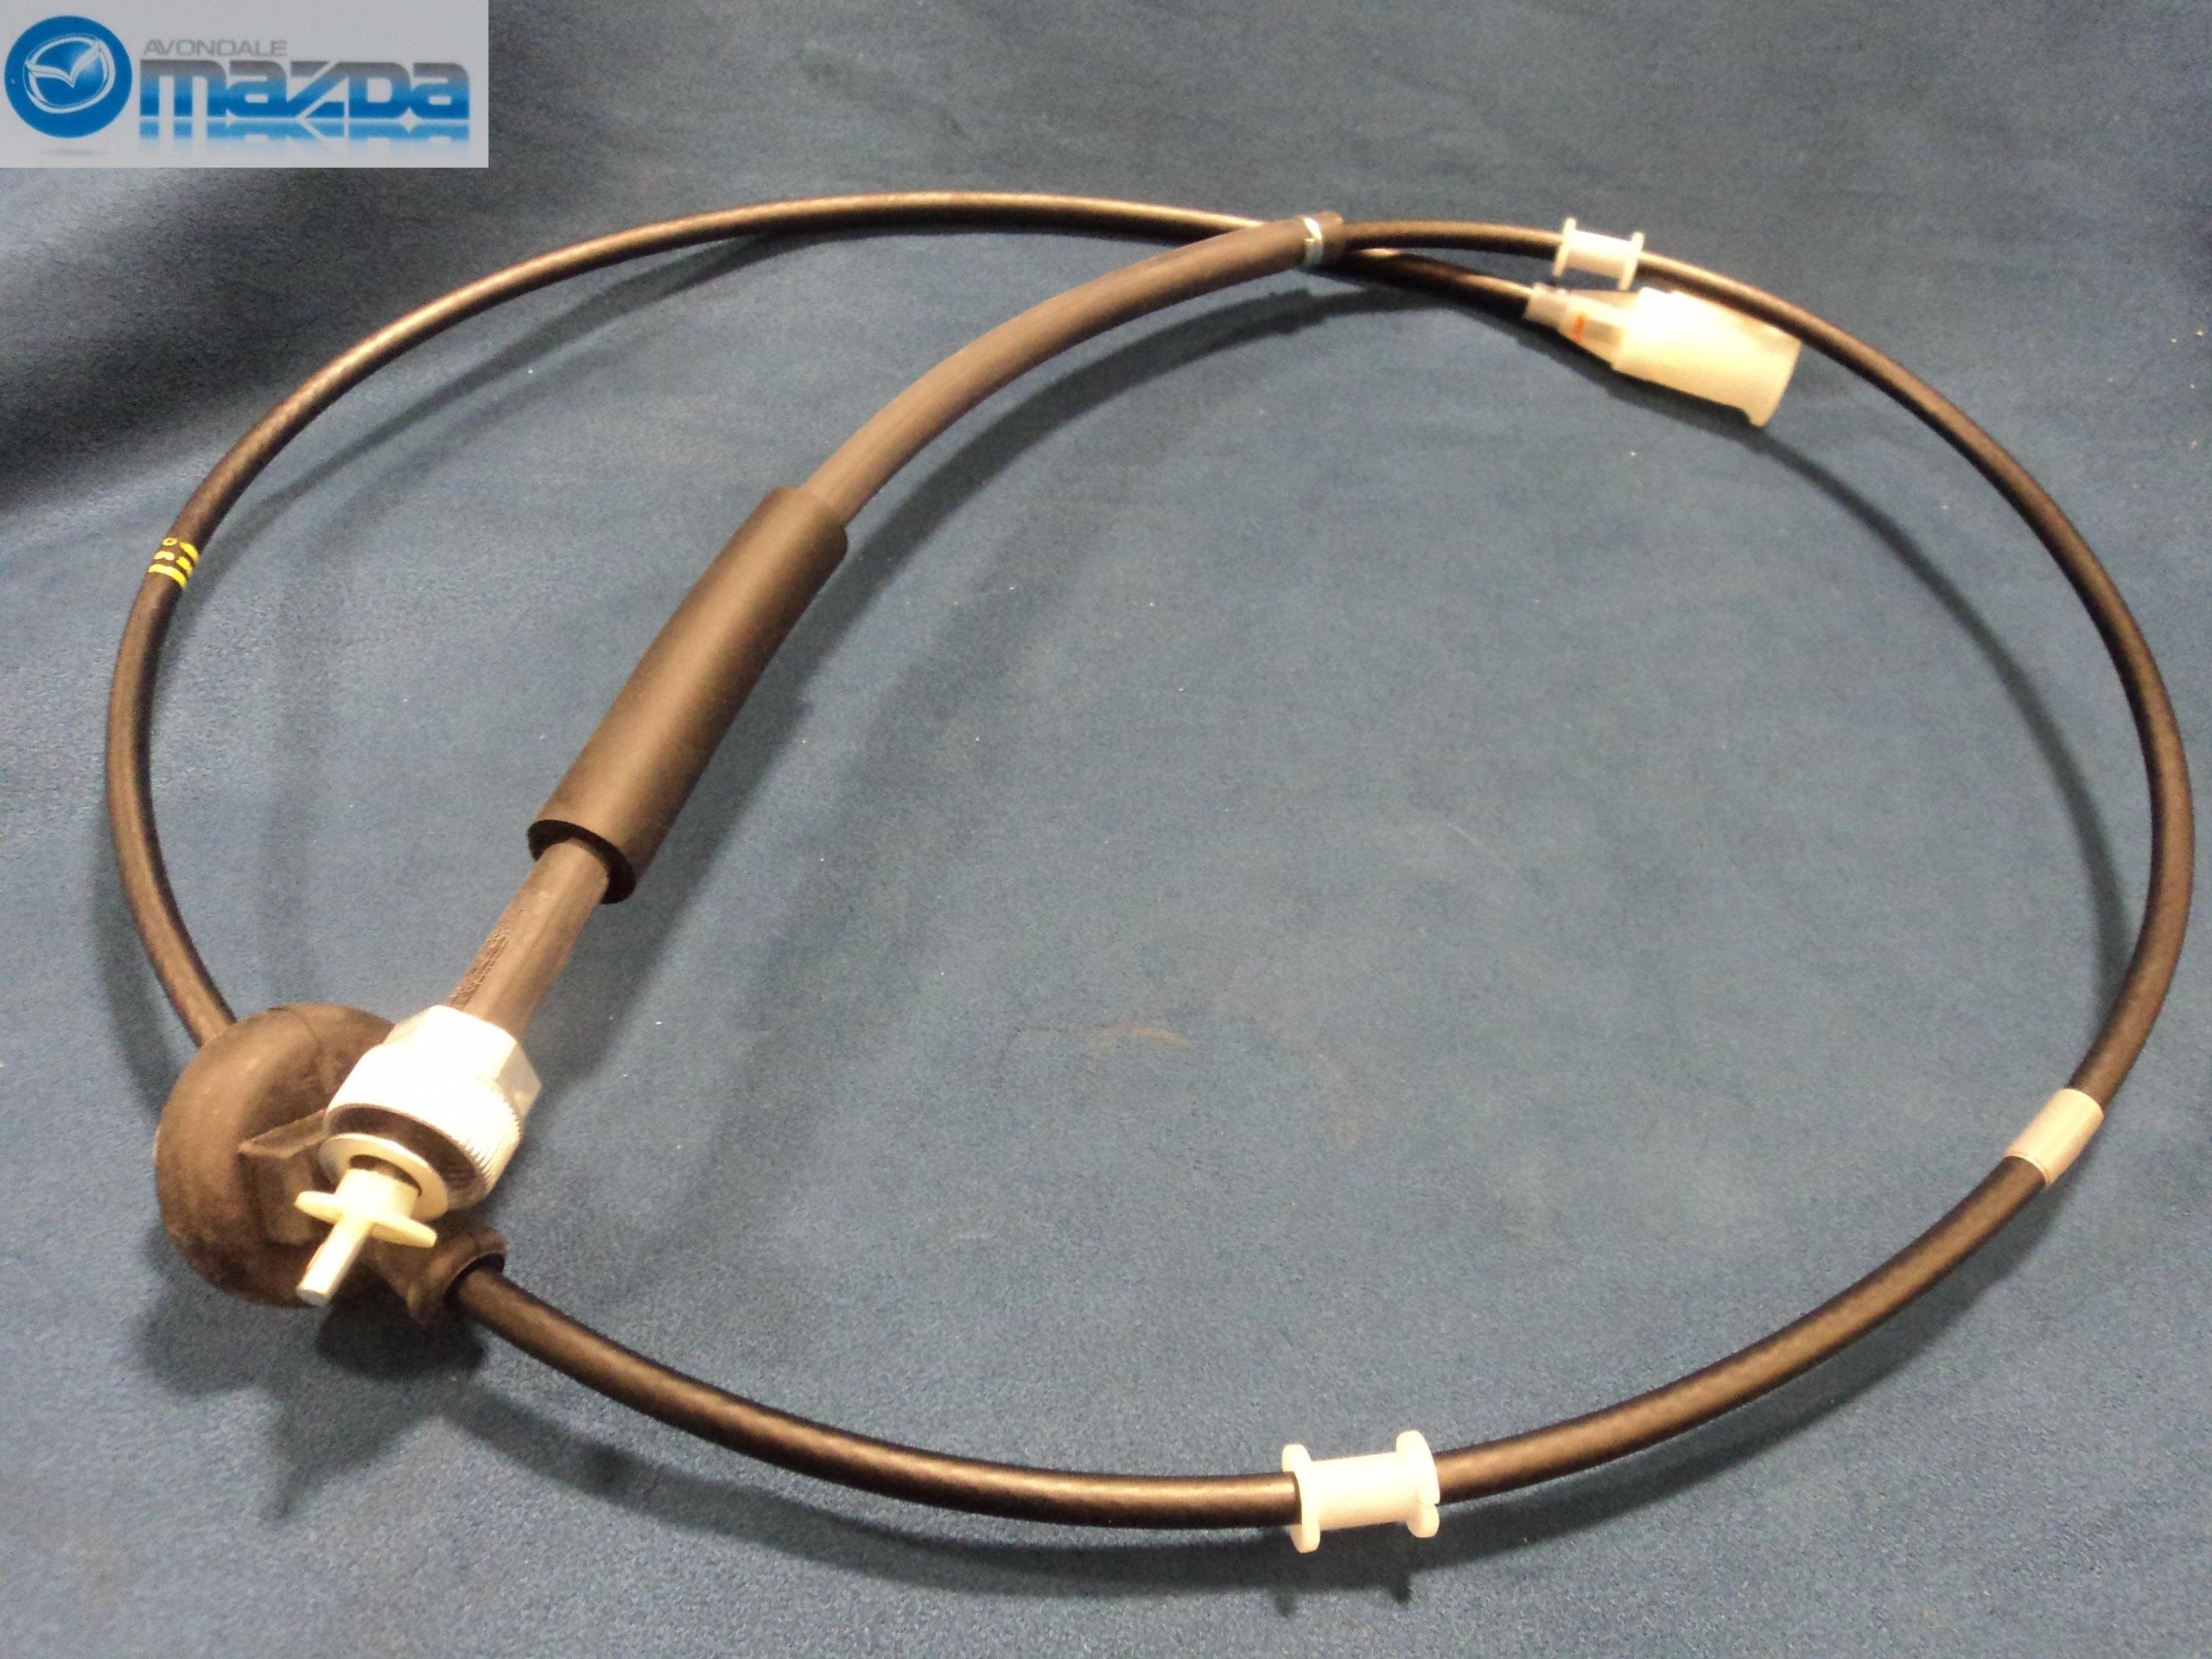 MAZDA MIATA 1990-1997 NEW OEM AUTOMATIC TRANSMISSION SPEEDO CABLE by Mazda